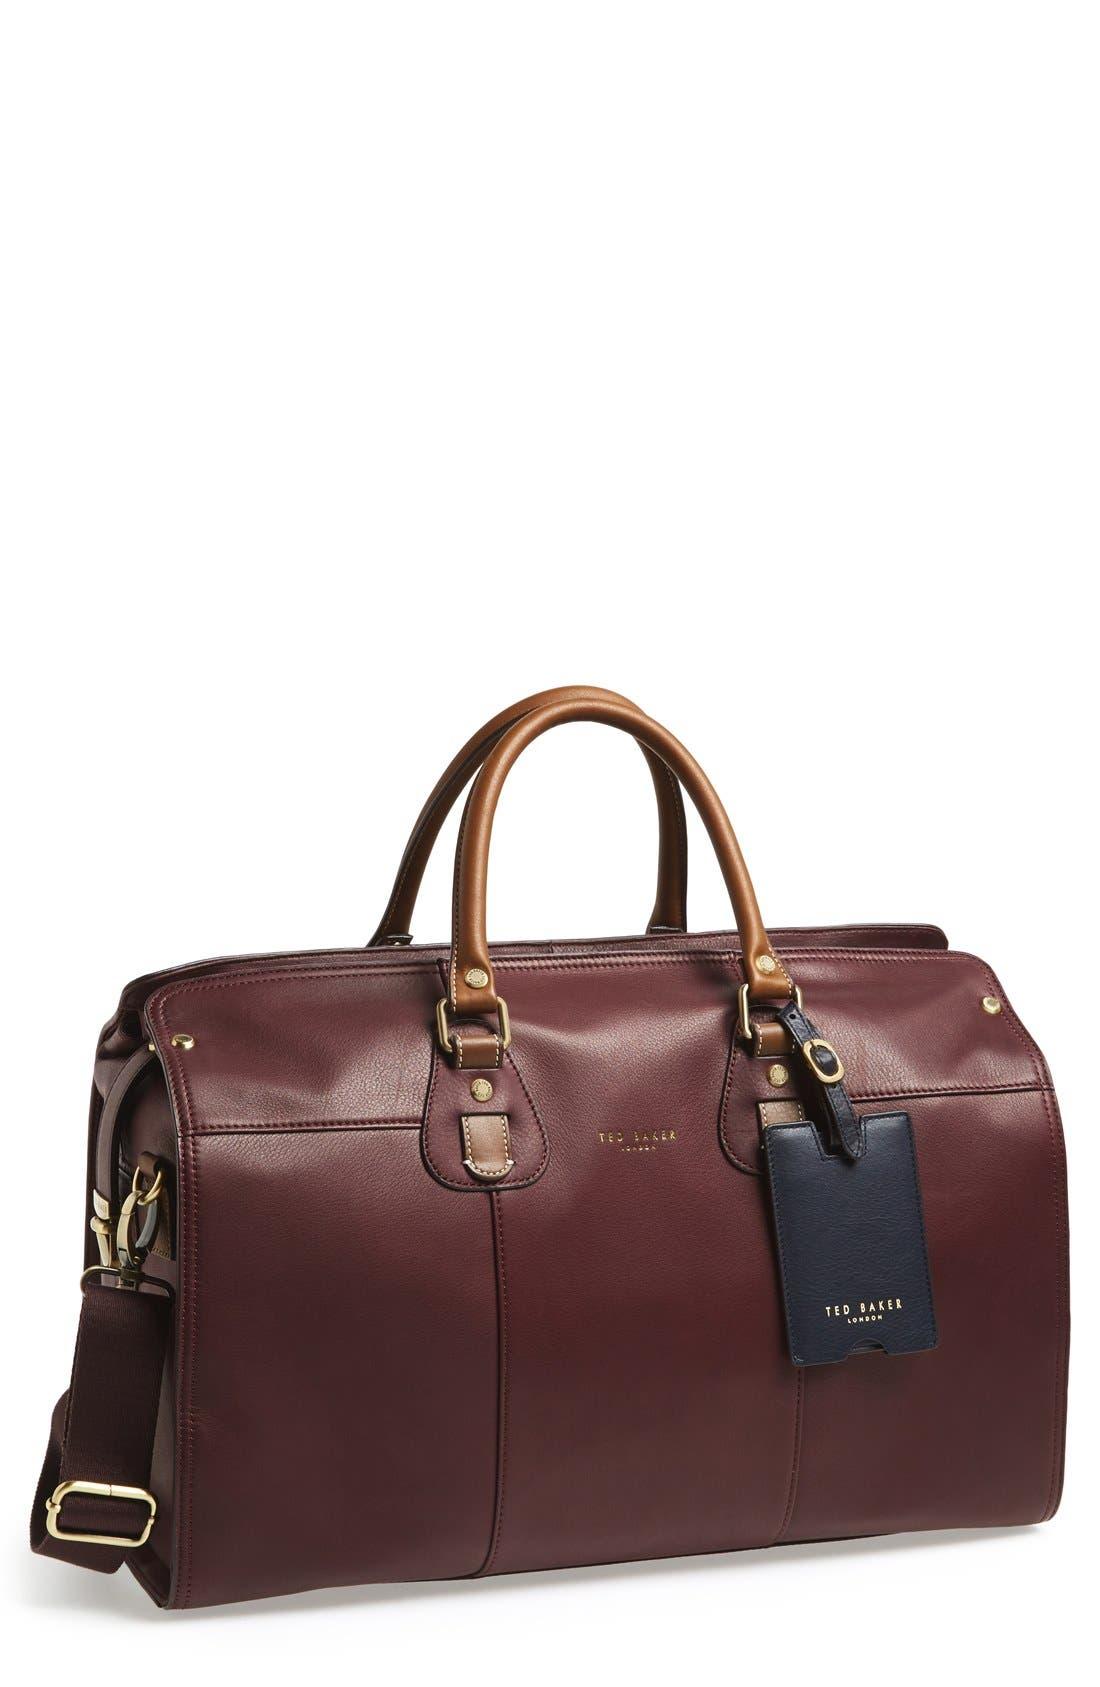 TED BAKER LONDON 'Kimyay' Duffel Bag, Main, color, 939